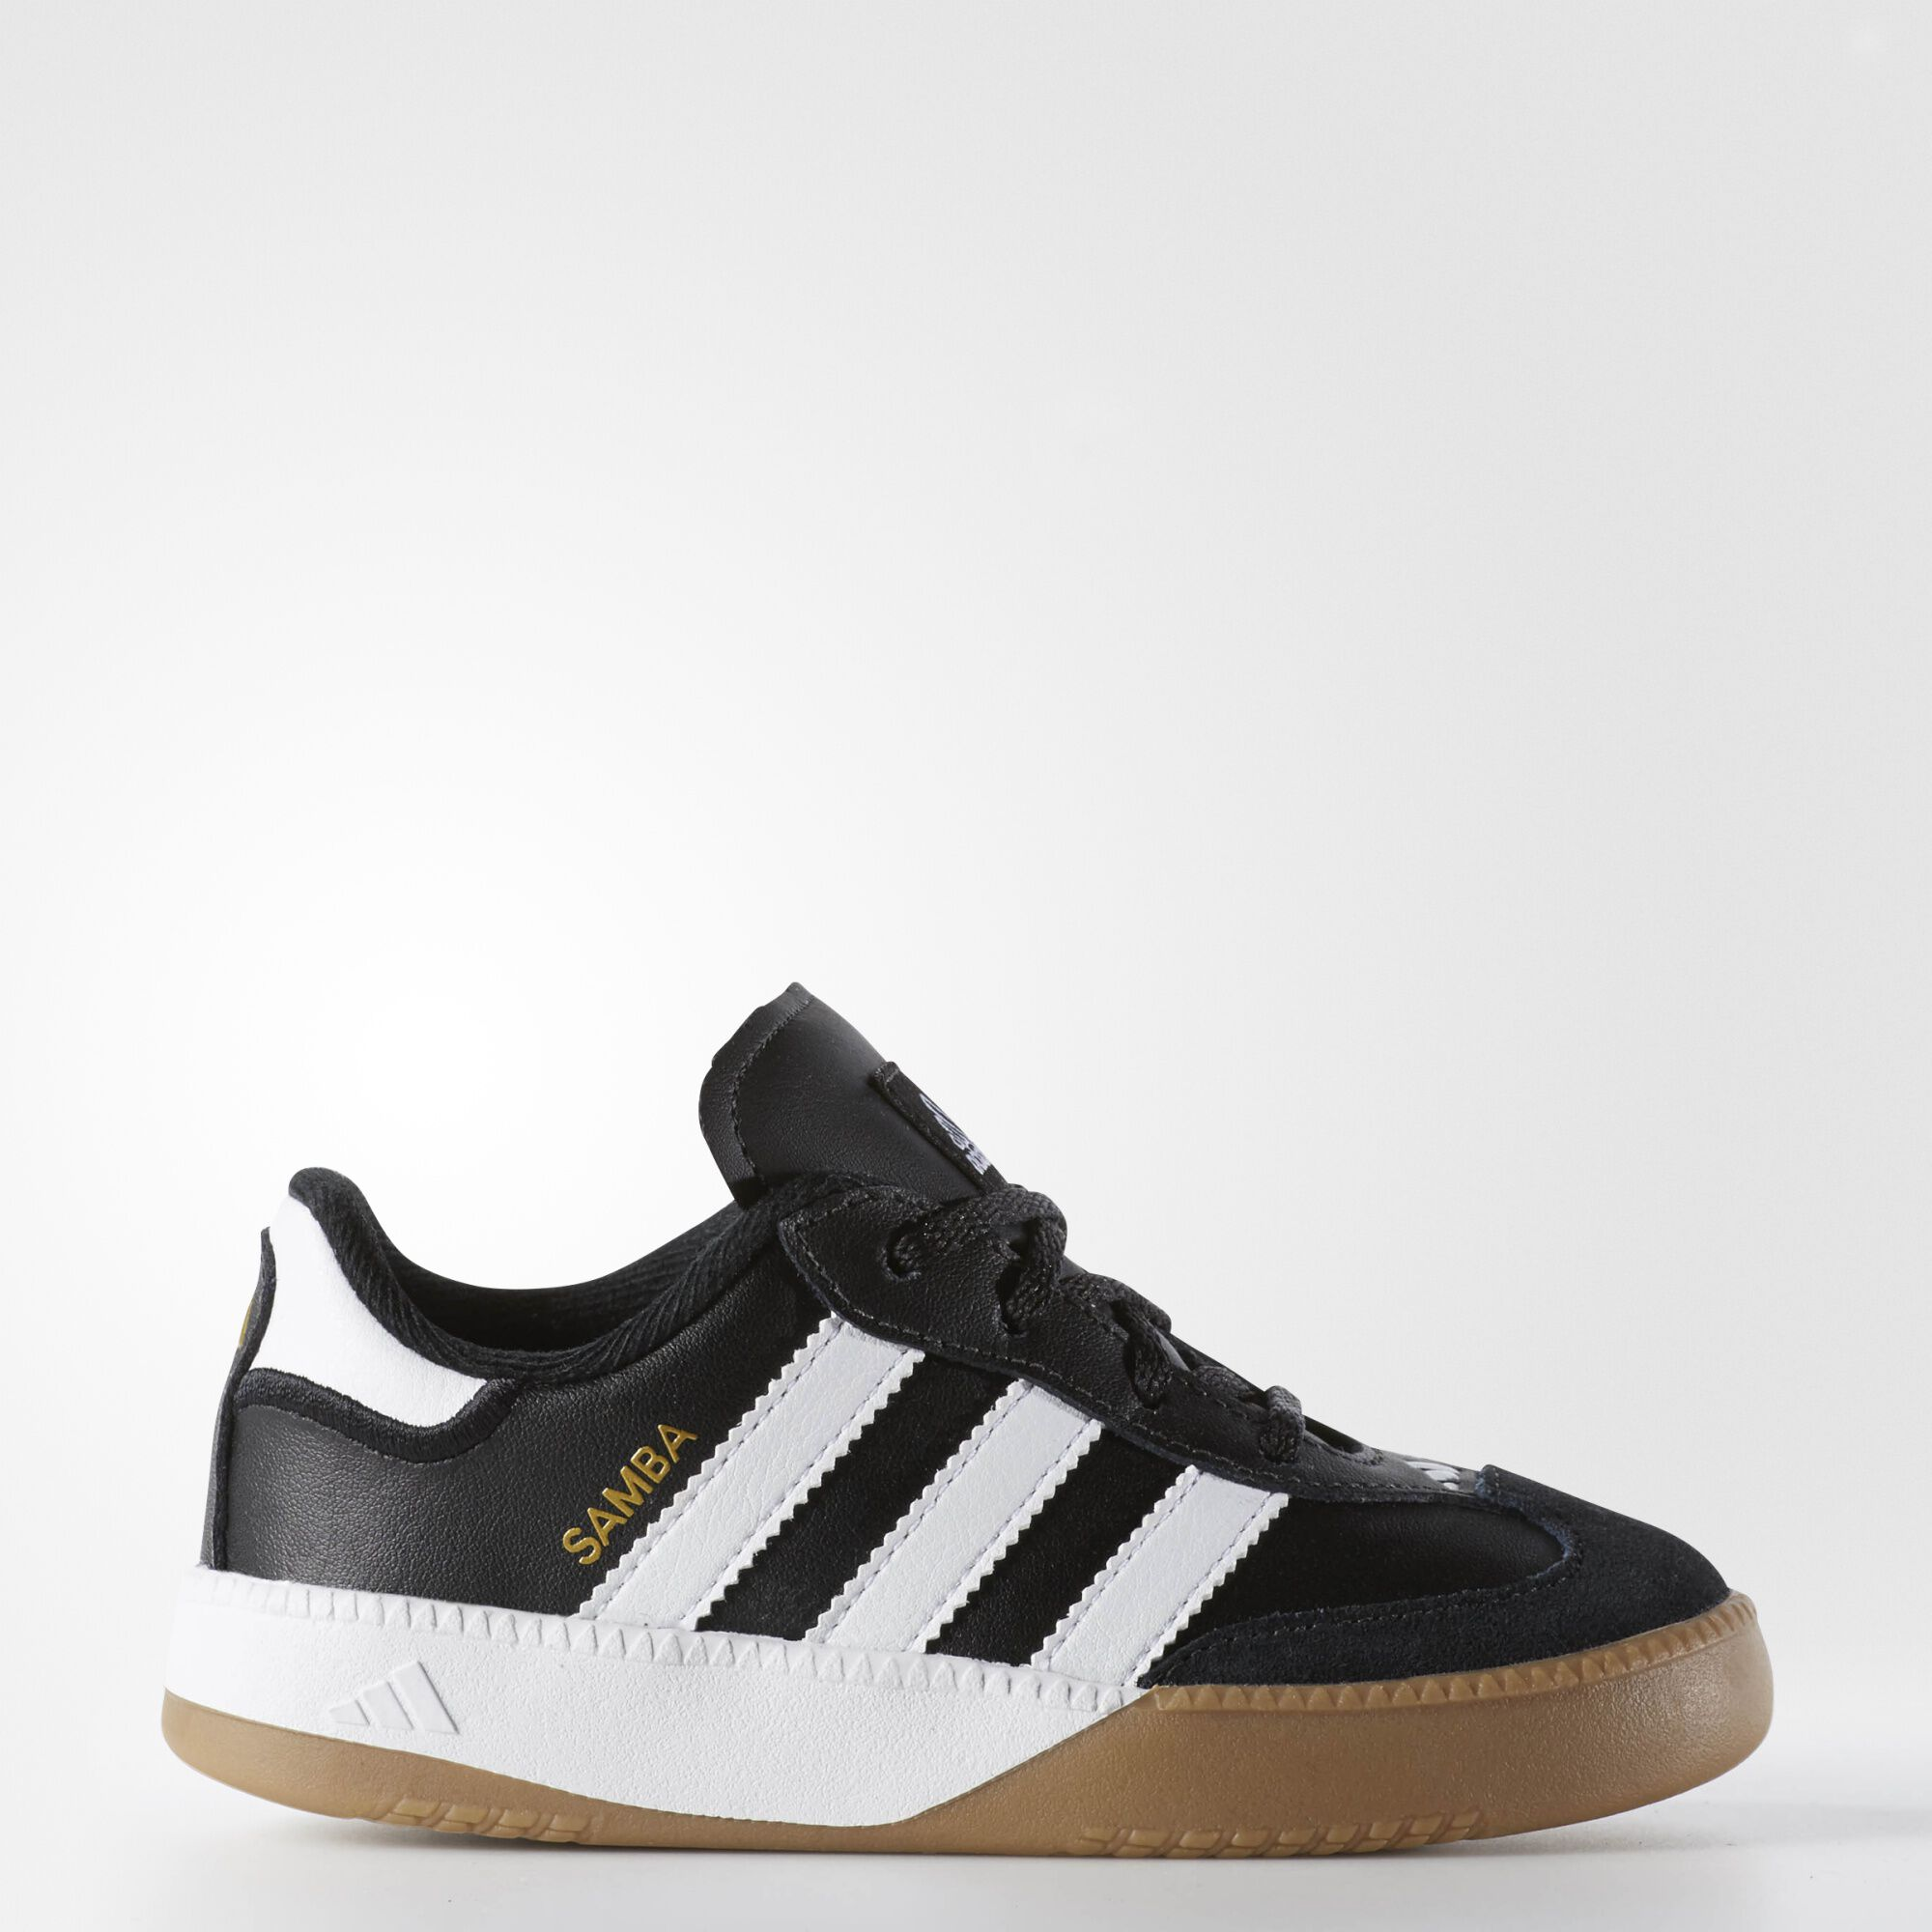 Toddler size 8 black dress shoes xx